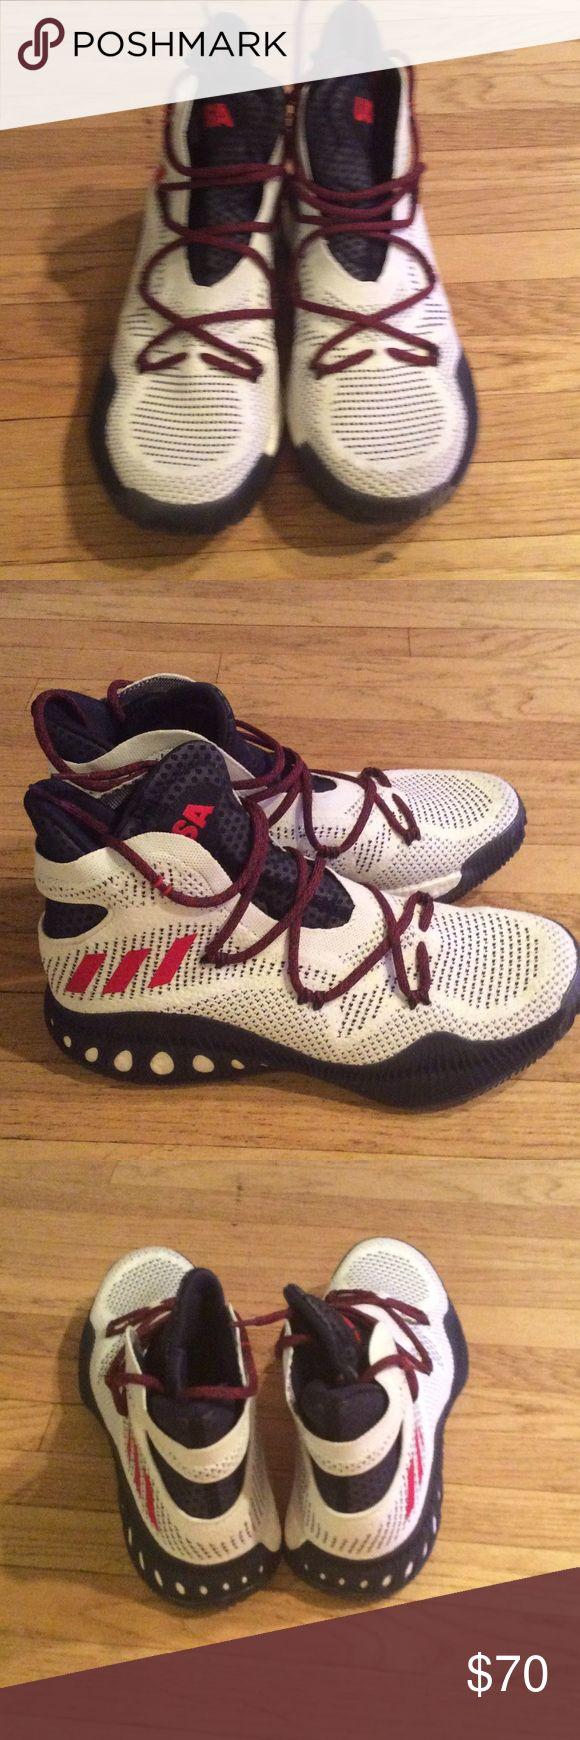 Adidas Geofit men's shoes Sz 13 Like new size 13 men's basketball Adidas geofit Adidas Shoes Sneakers